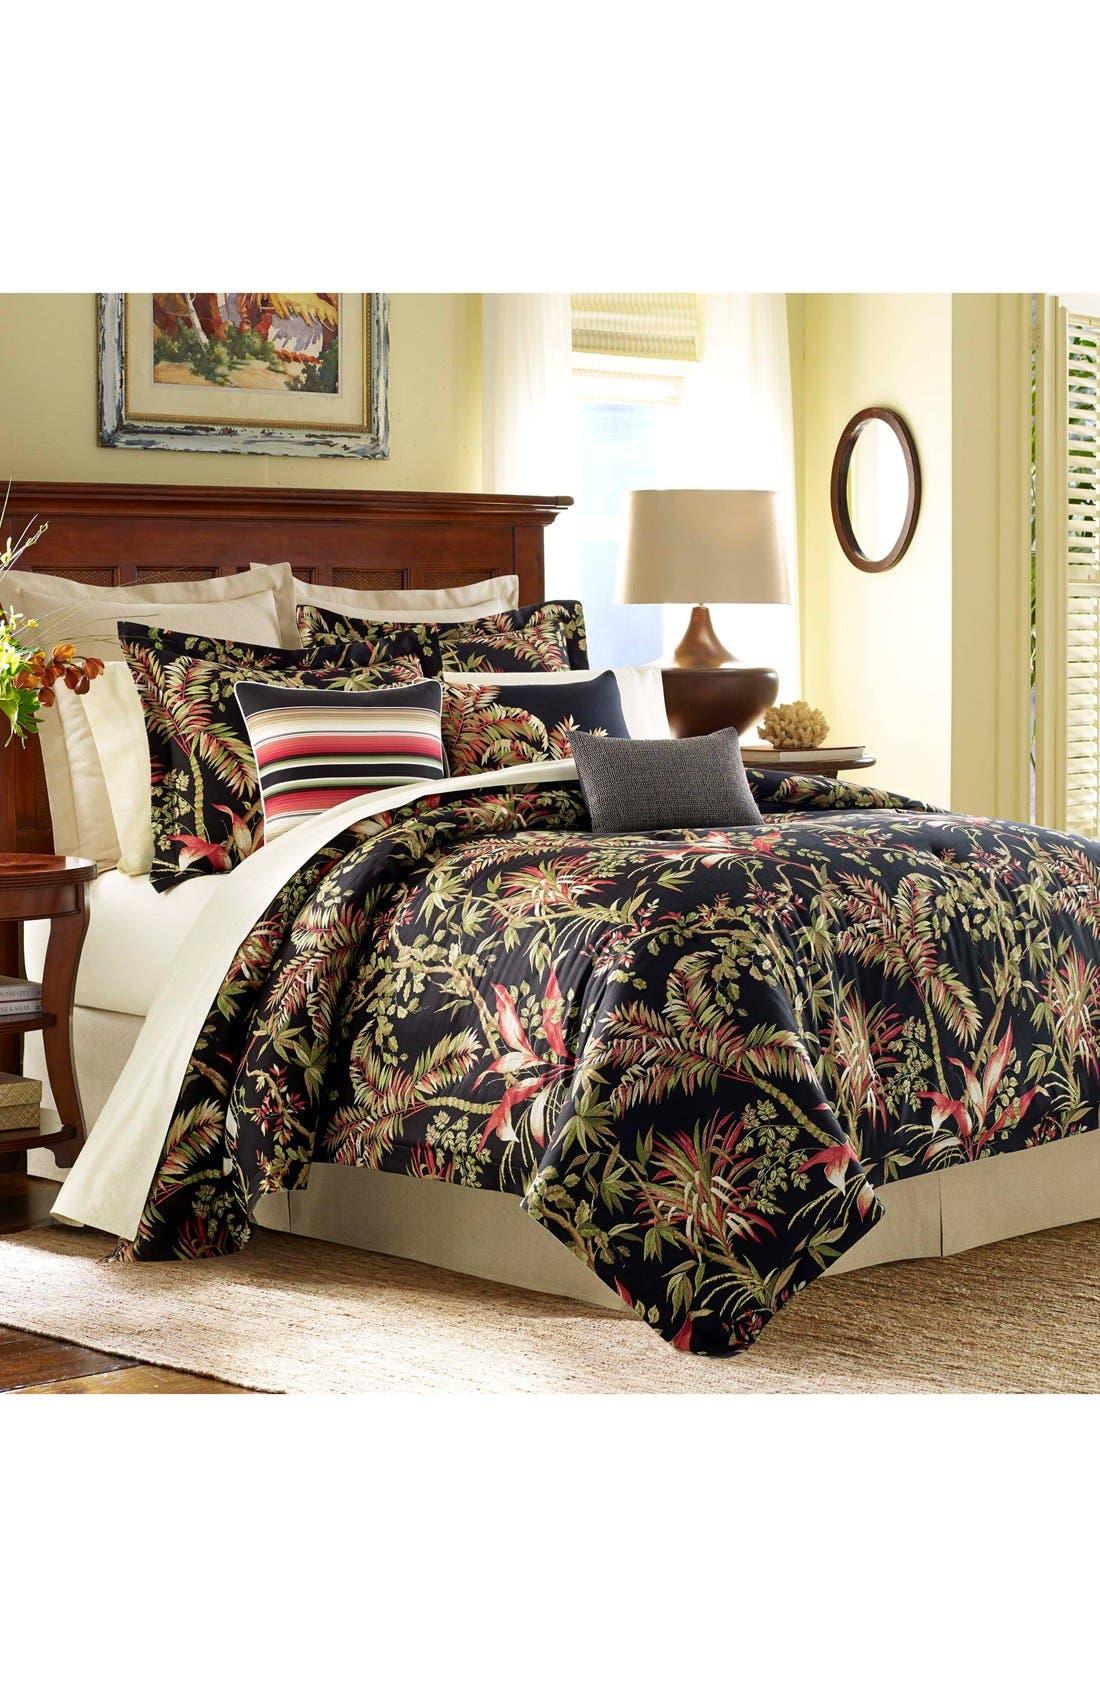 Alternate Image 1 Selected - Tommy Bahama Jungle Drive Comforter, Sham & Bed Skirt Set